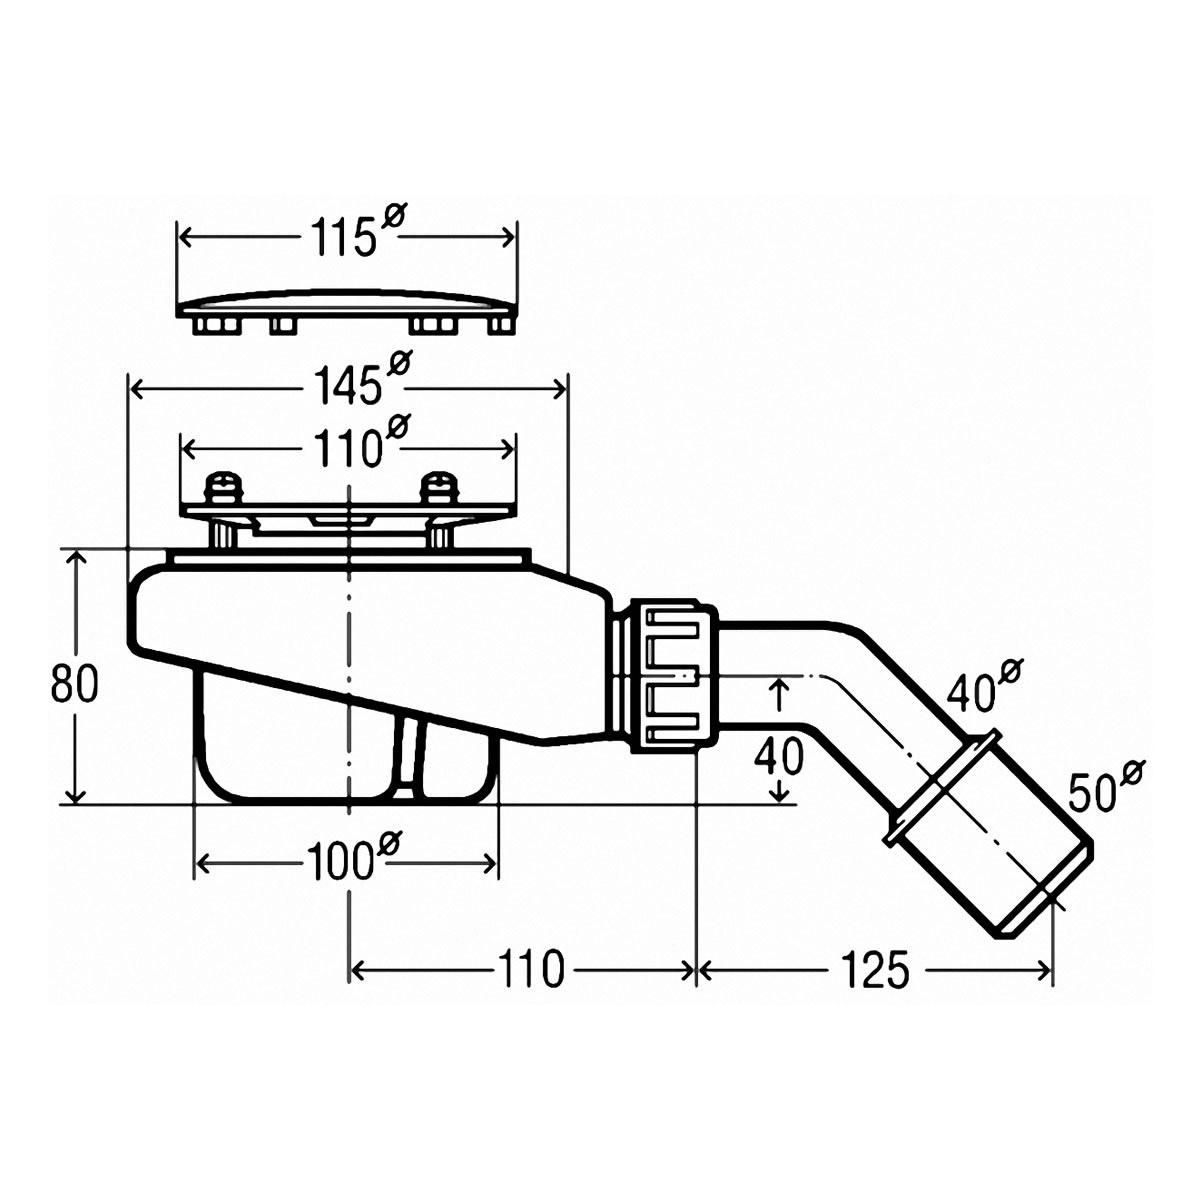 viega tempoplex ablaufgarnitur f r 90mm ablaufloch dn 40. Black Bedroom Furniture Sets. Home Design Ideas